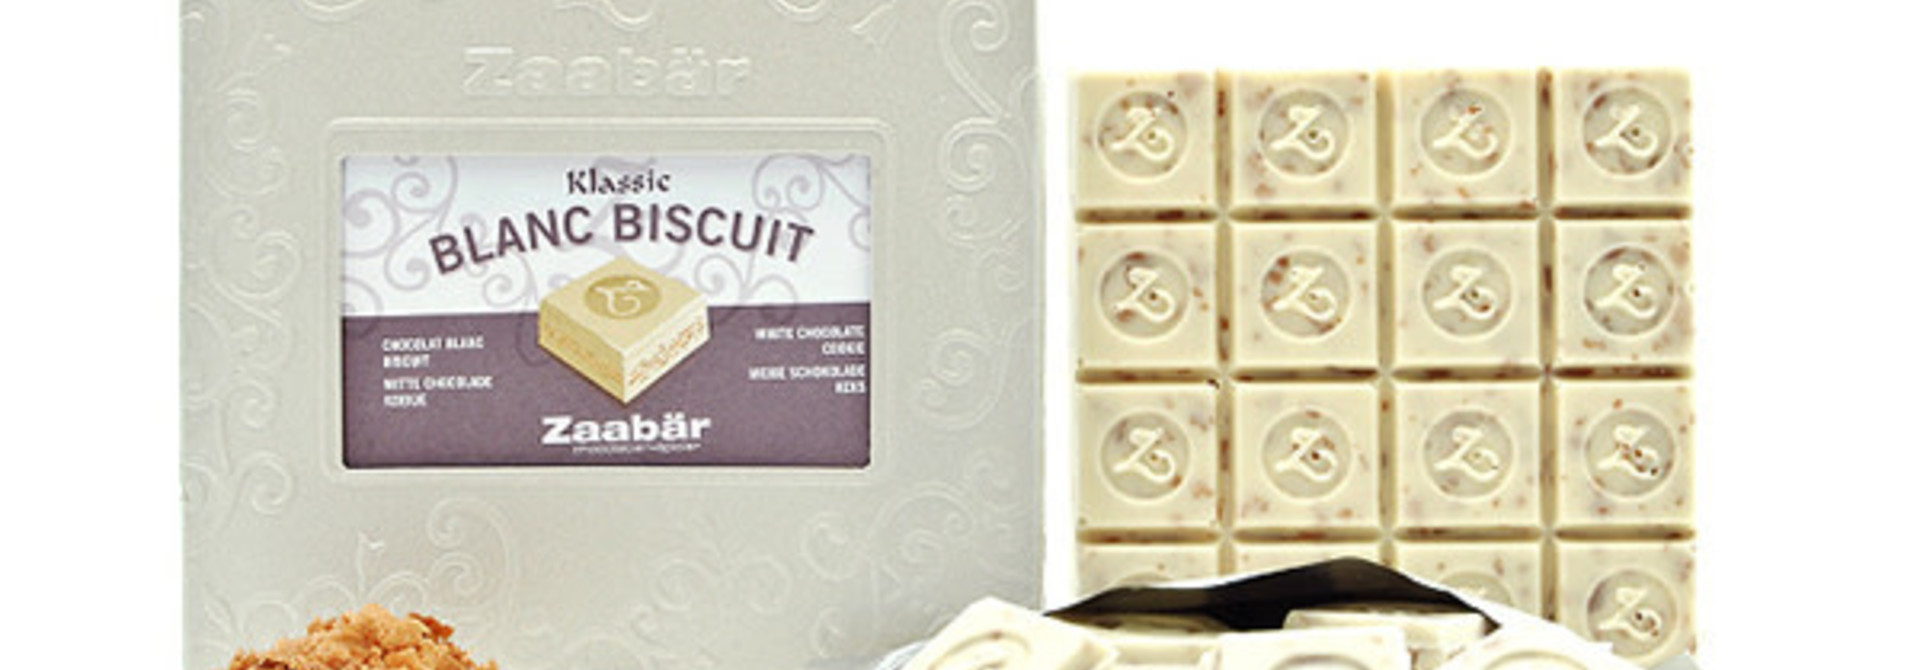 Klassic blanc biscuit